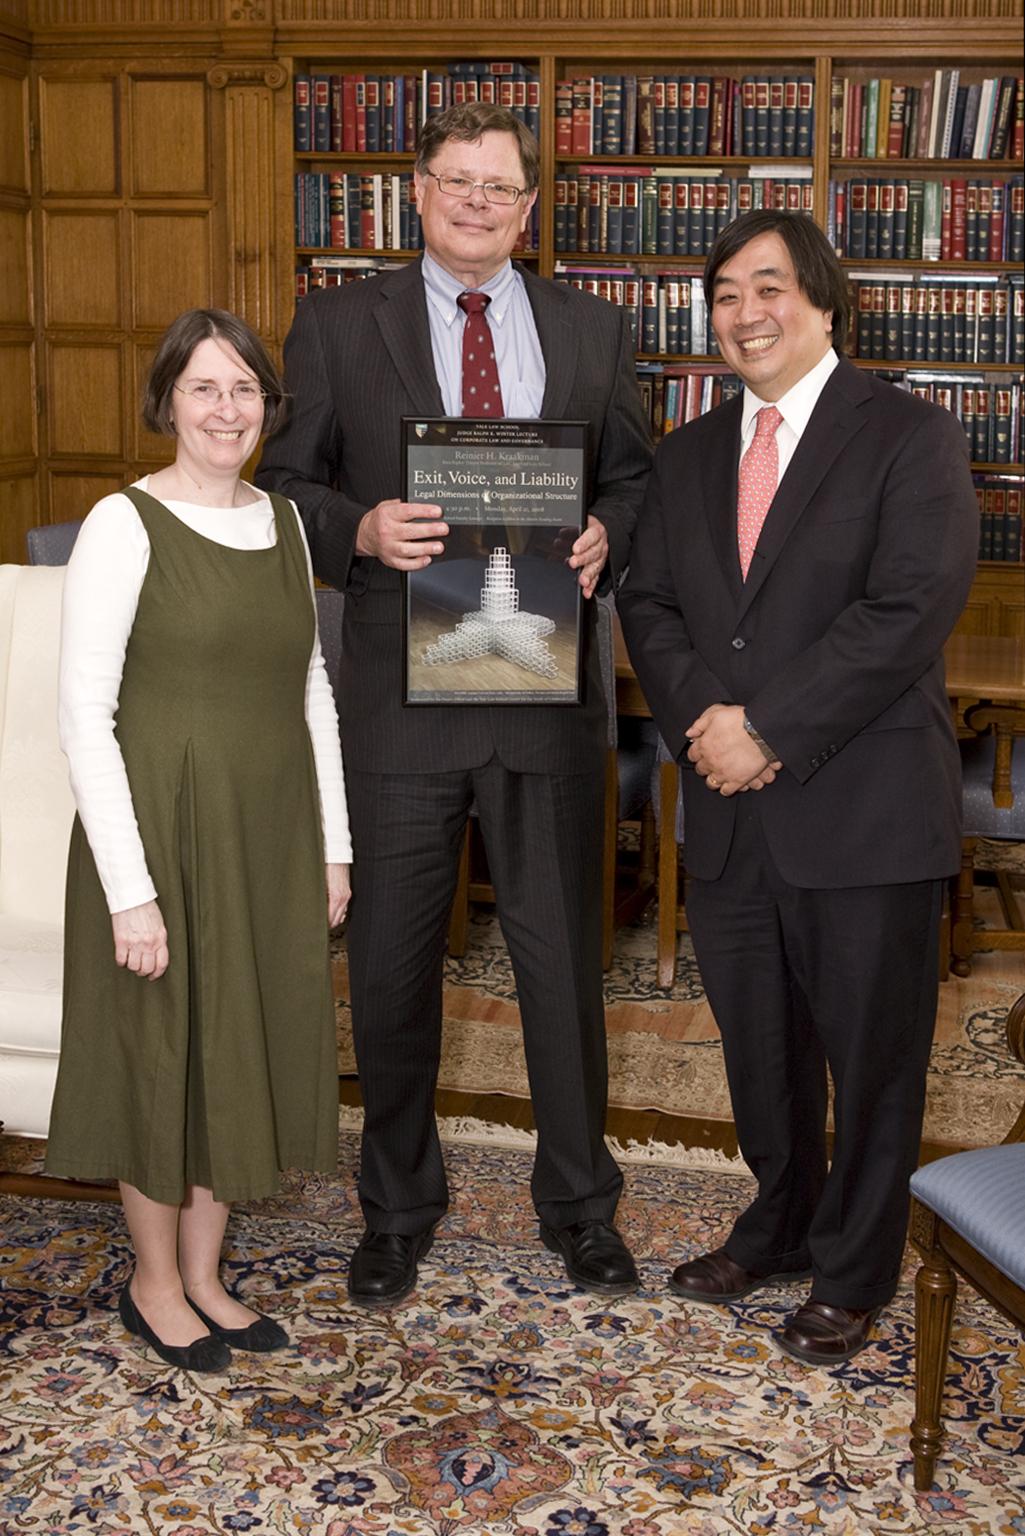 YLS Prof. and Center Dir. Roberta Romano '80, Harvard Law Prof. Reinier Kraakman '79, and YLS Dean Harold Koh